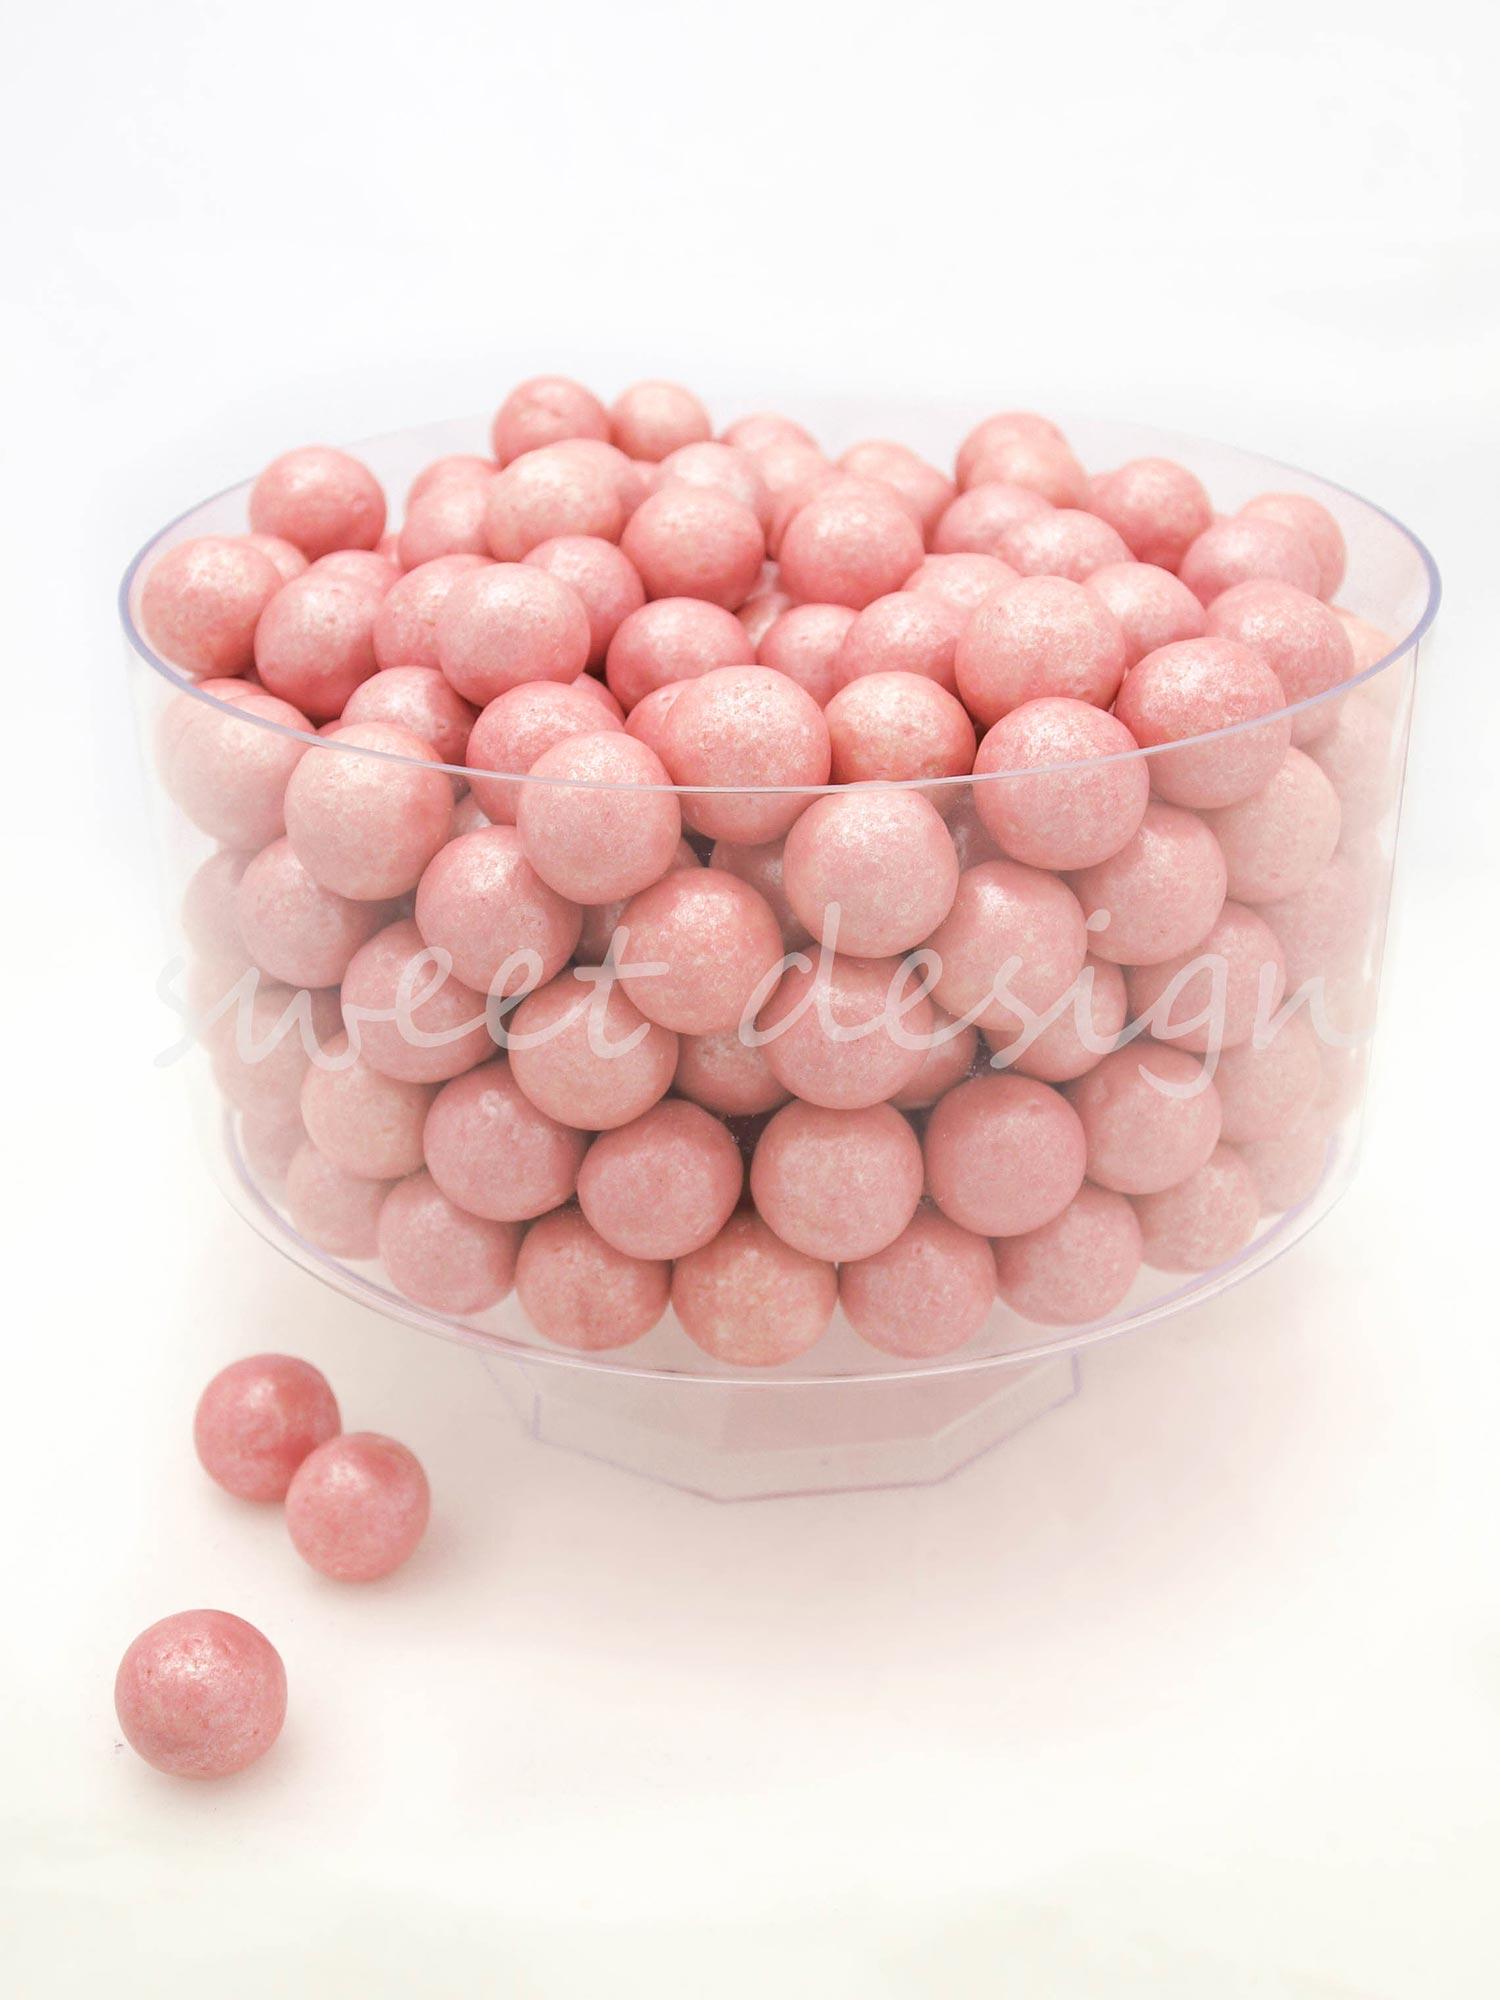 limpiar blanco chupando bolas